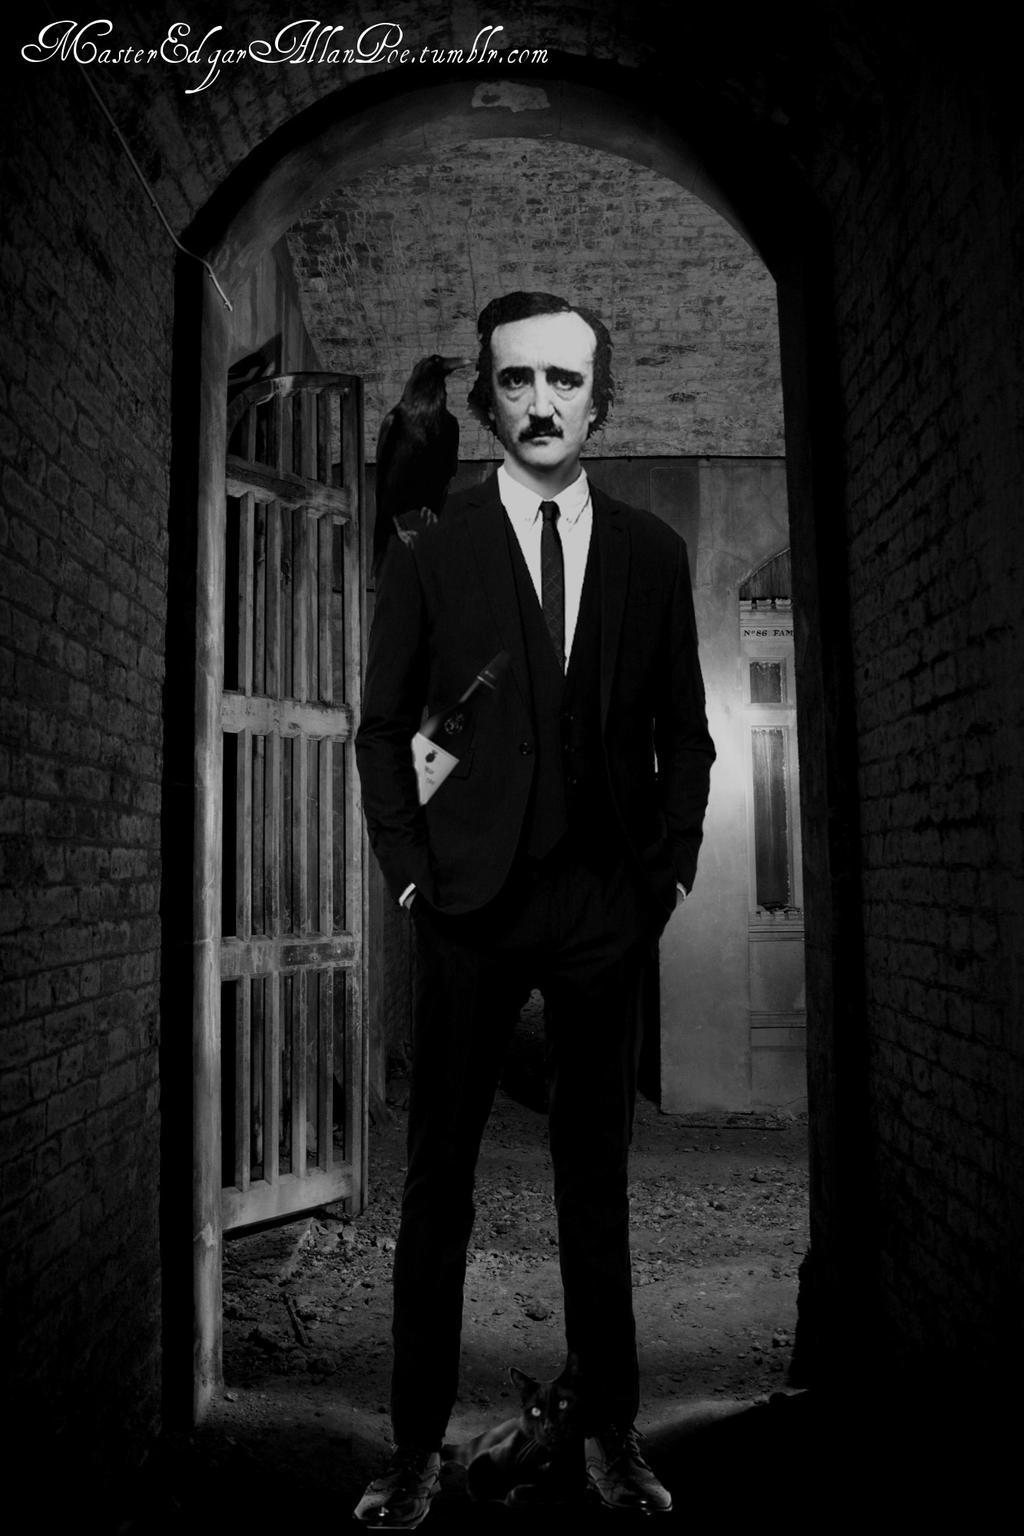 The Black Cat Video Edgar Allan Poe